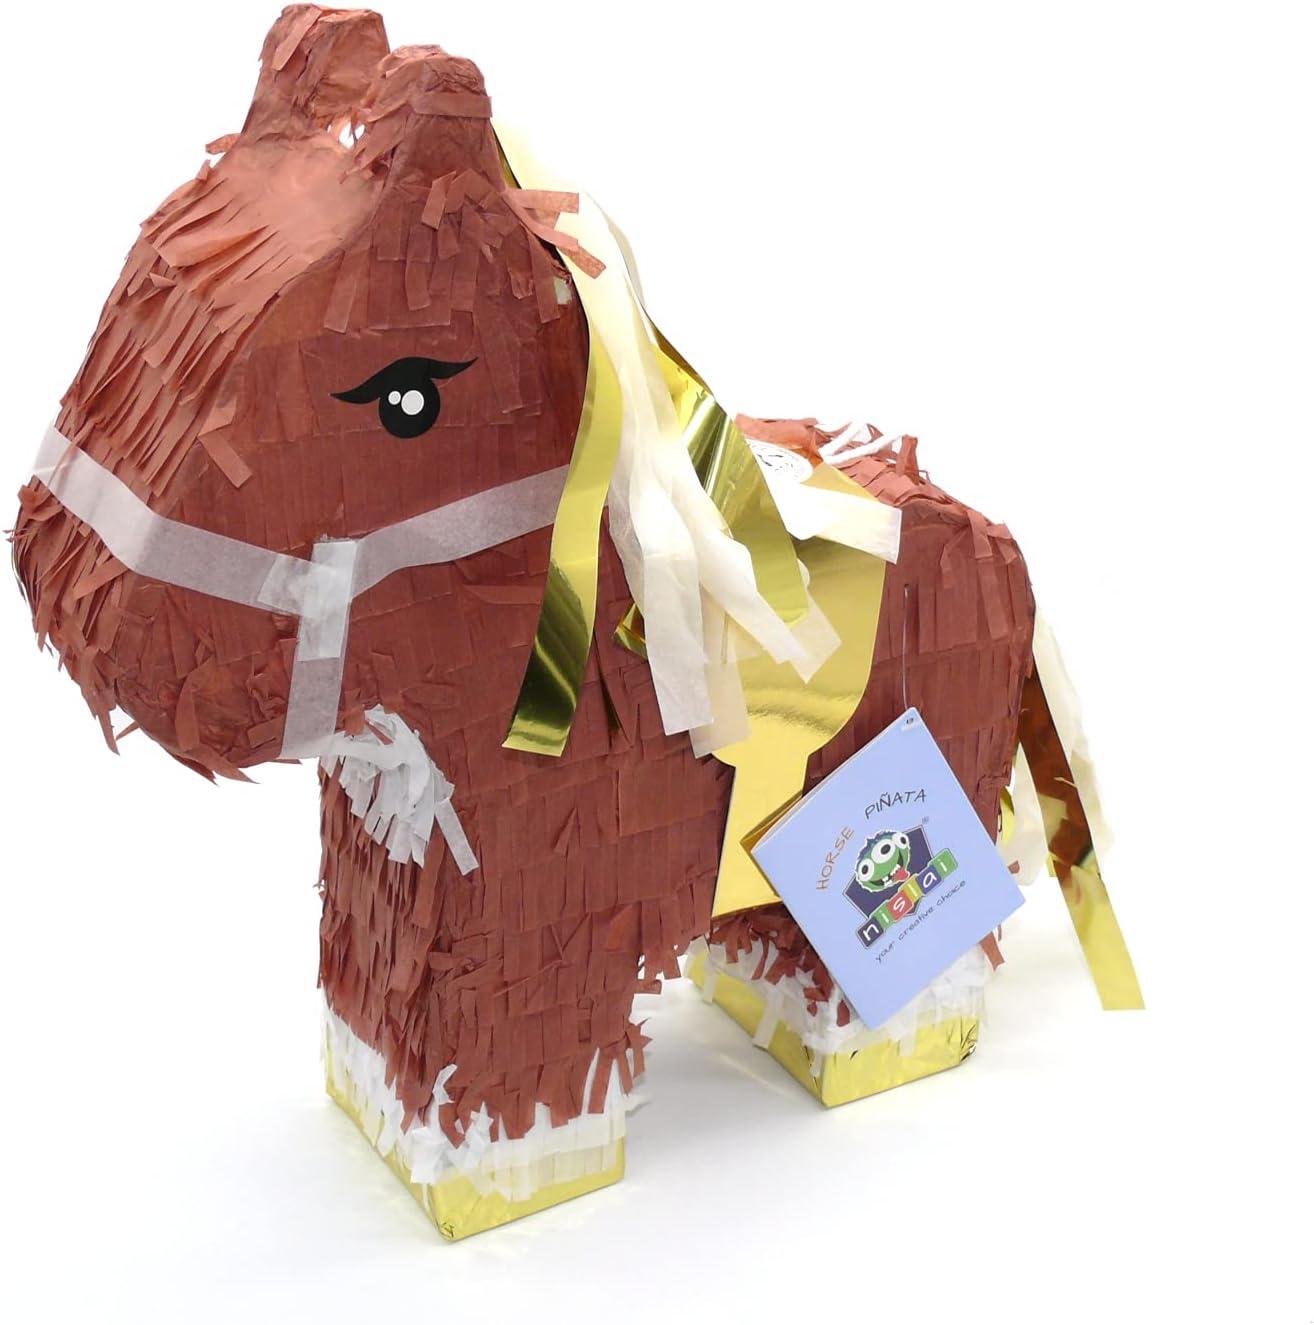 Nislai® Piñata Caballo | Ideal para la Fiesta de caballo o animales | Regalo piñata | piñata de cumpleaños | Fiestas Infantiles | tamaño Aprox. 44x33x10 cm